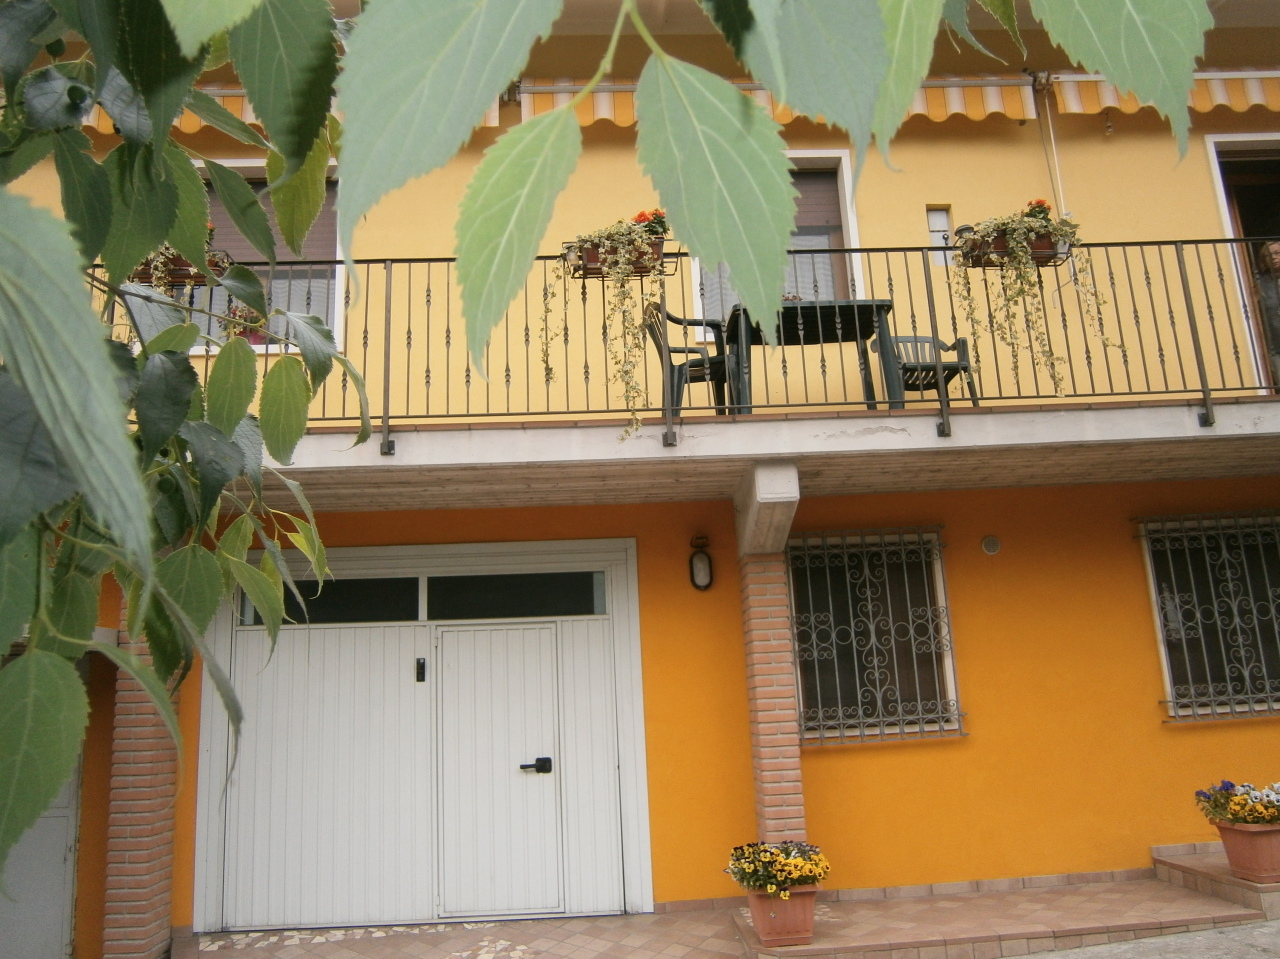 Soluzione Indipendente in vendita a Sarego, 9 locali, Trattative riservate | CambioCasa.it